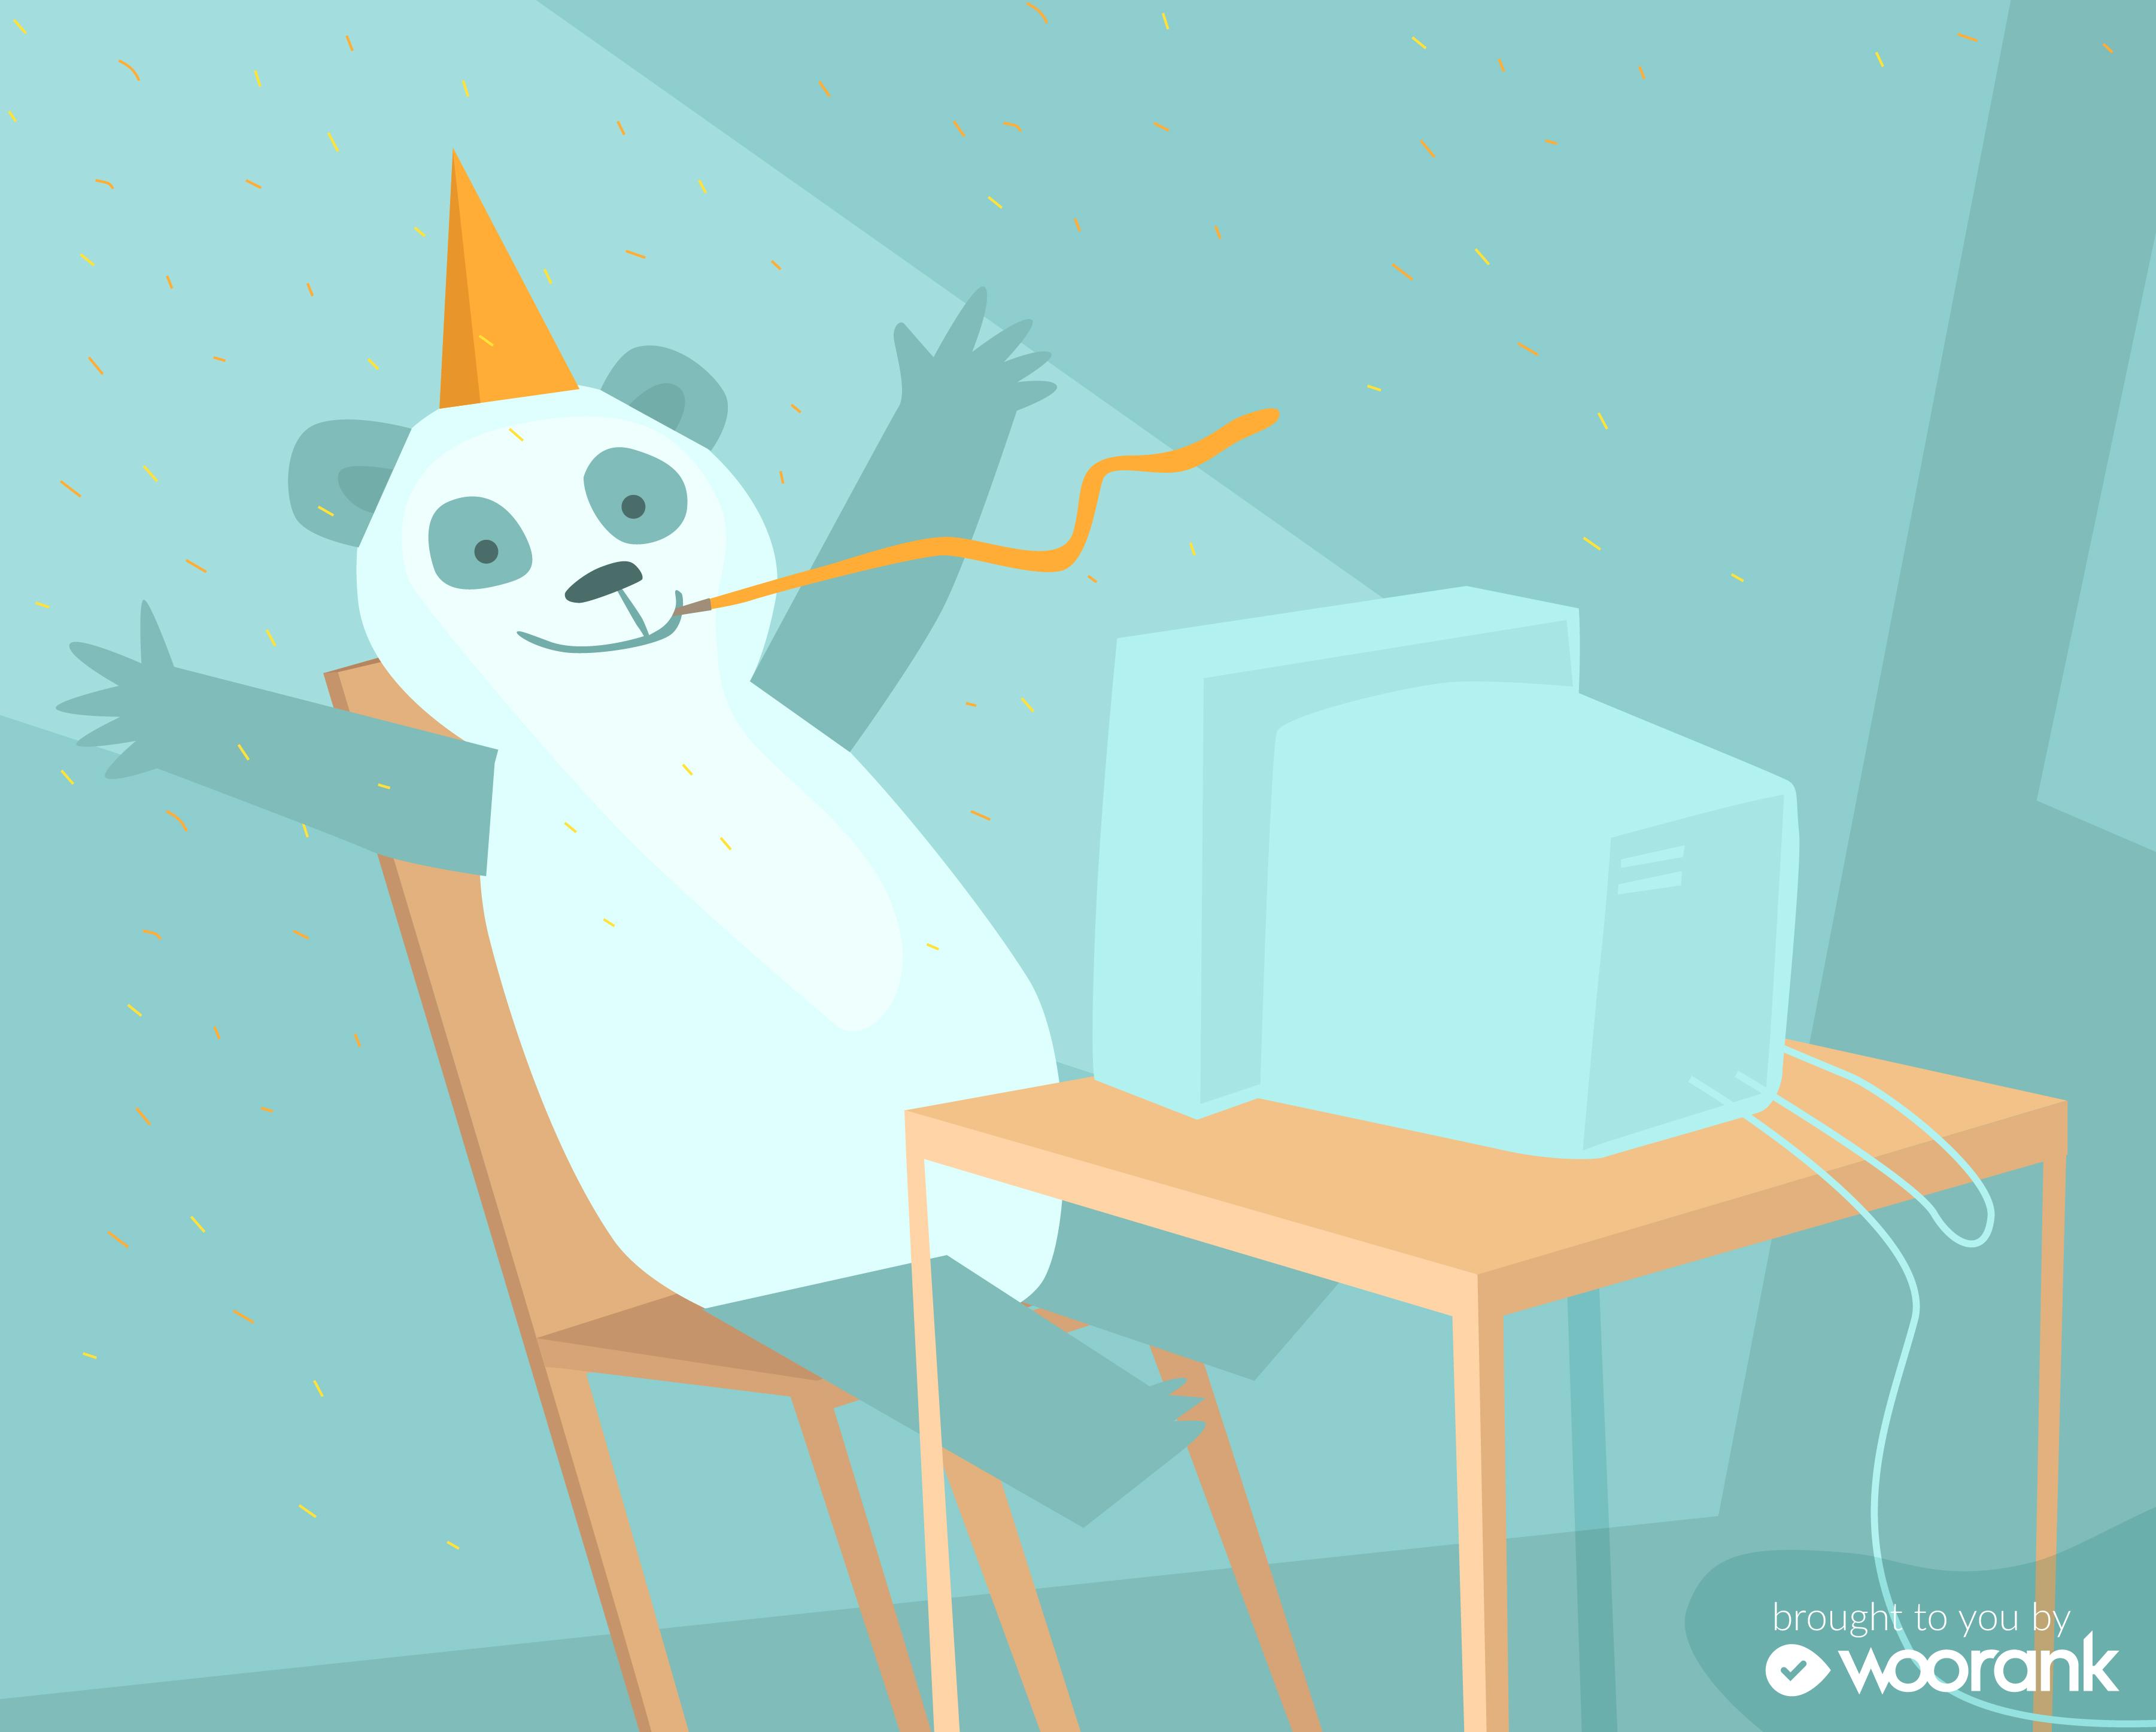 panda de celebración, panda, panda feliz, fiesta de panda, fiesta panda, celebración panda , oso panda, celebración del oso panda